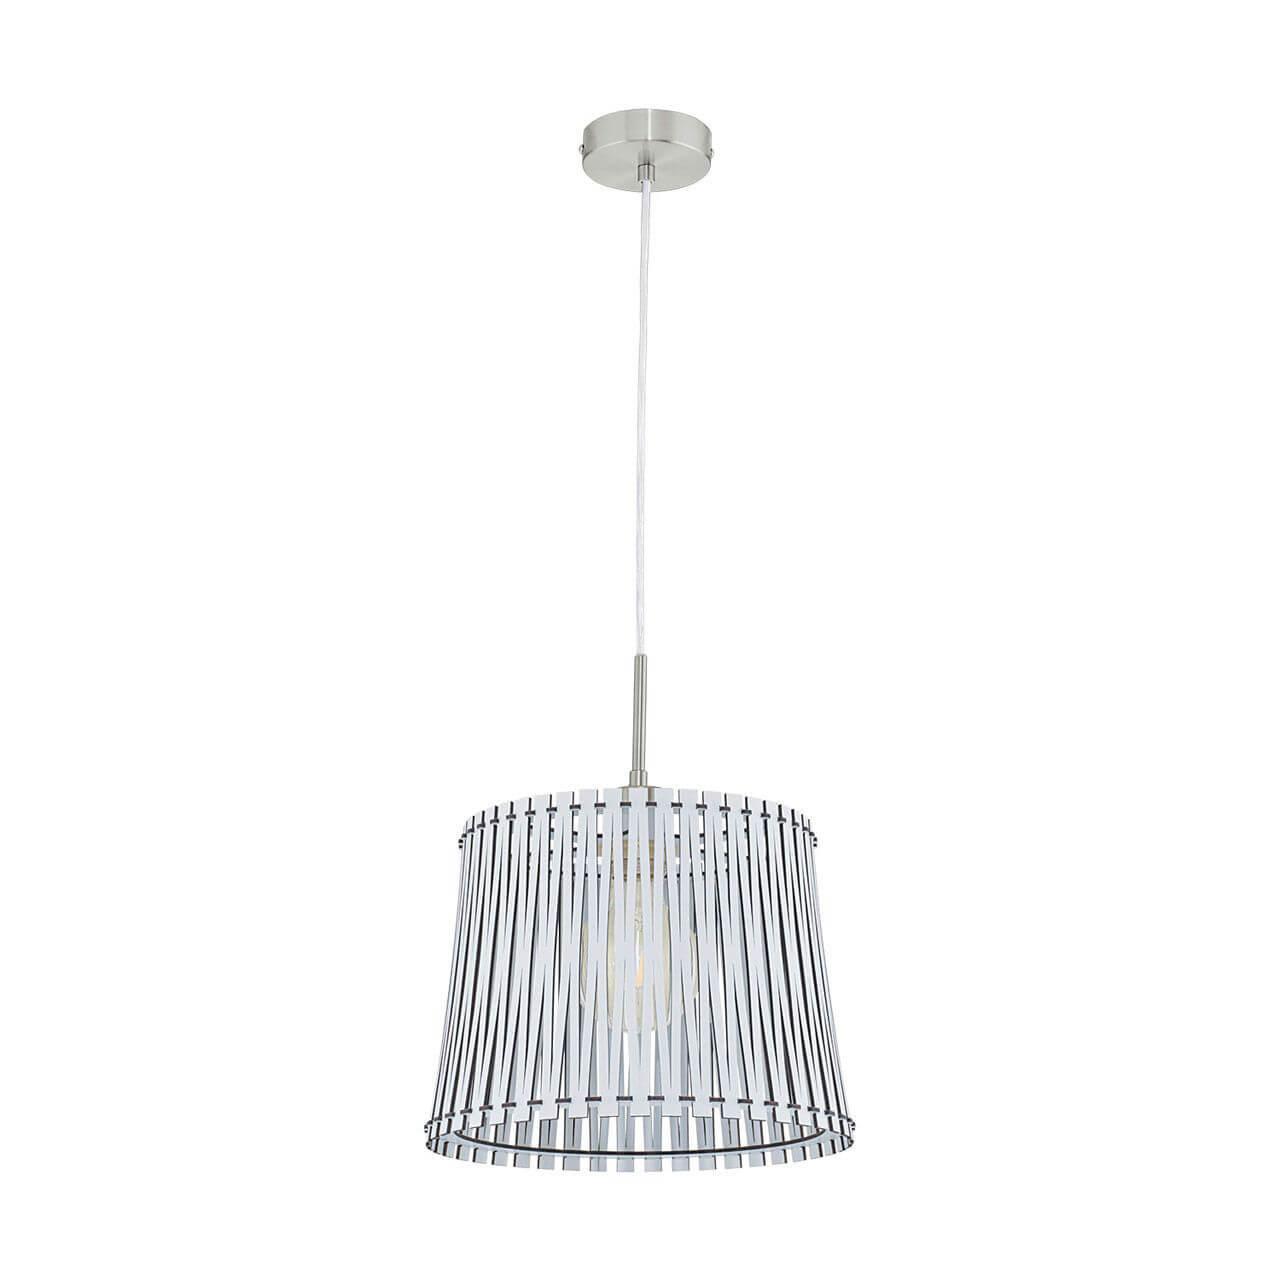 Подвесной светильник Eglo Sendero 96184 цены онлайн